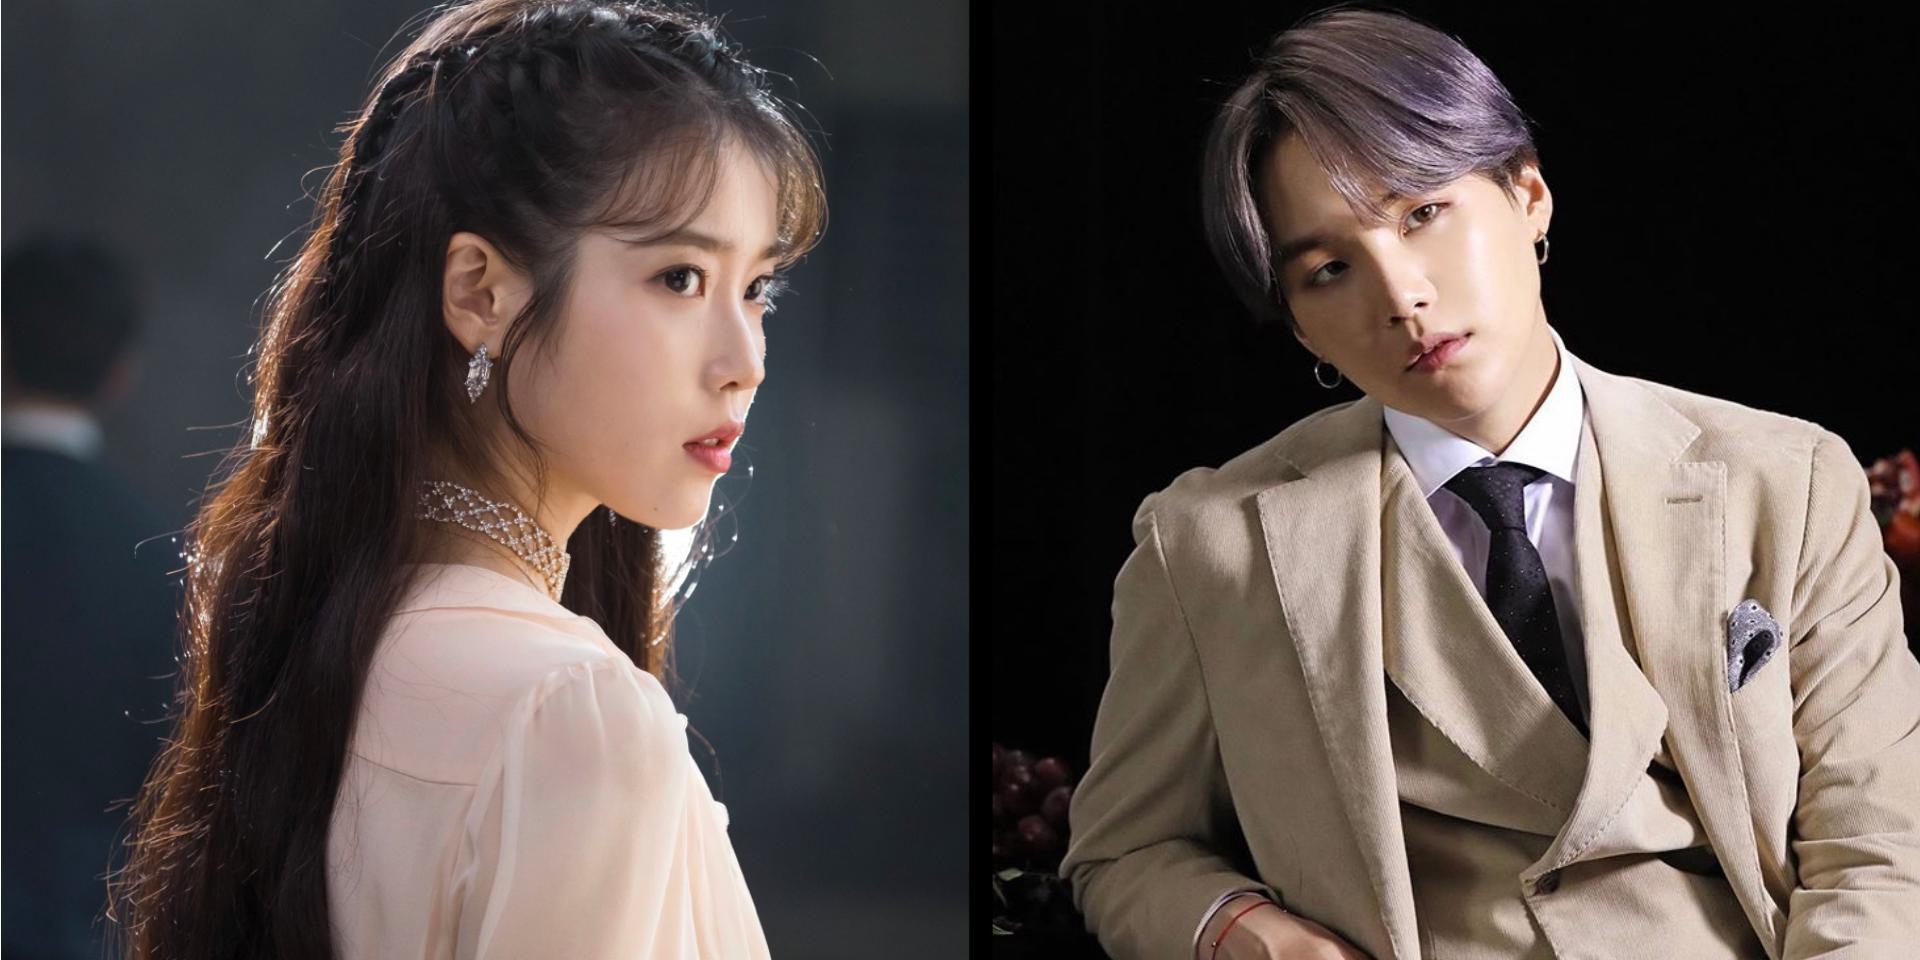 IU's collaboration with BTS' Suga sends K-pop fans rejoicing